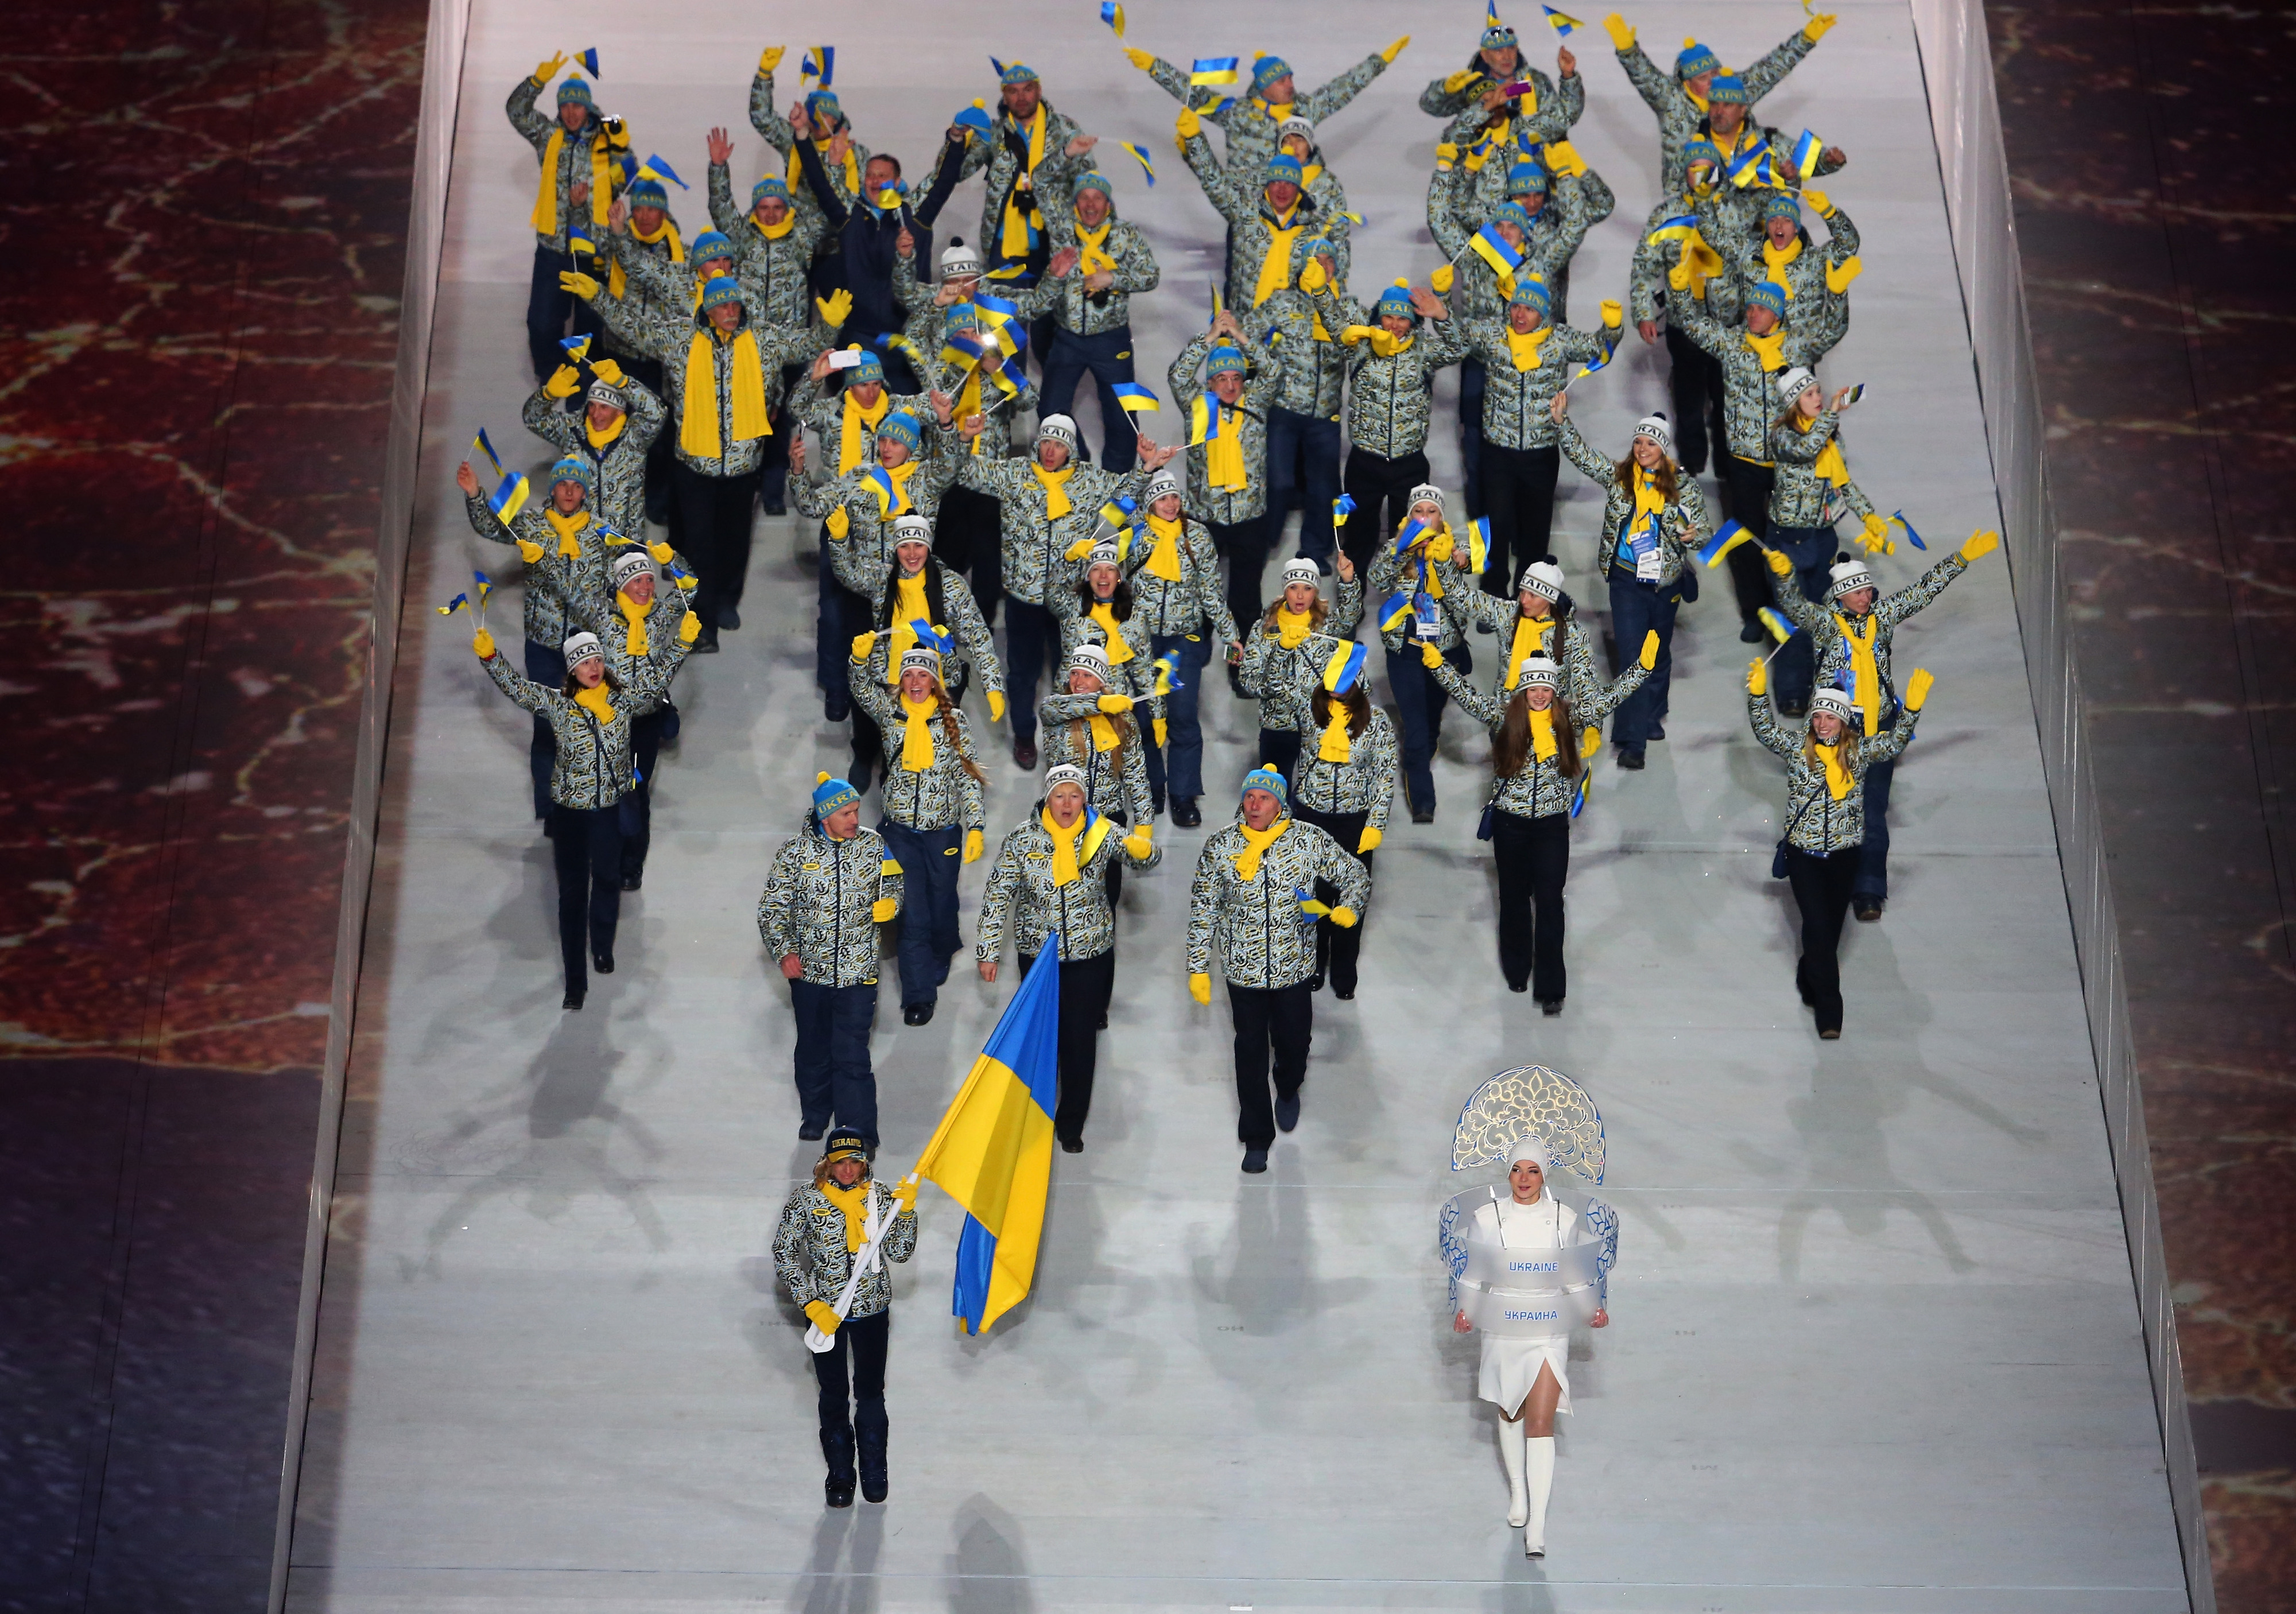 Ukrainian Olympic team denied Kiev commemoration, according to report